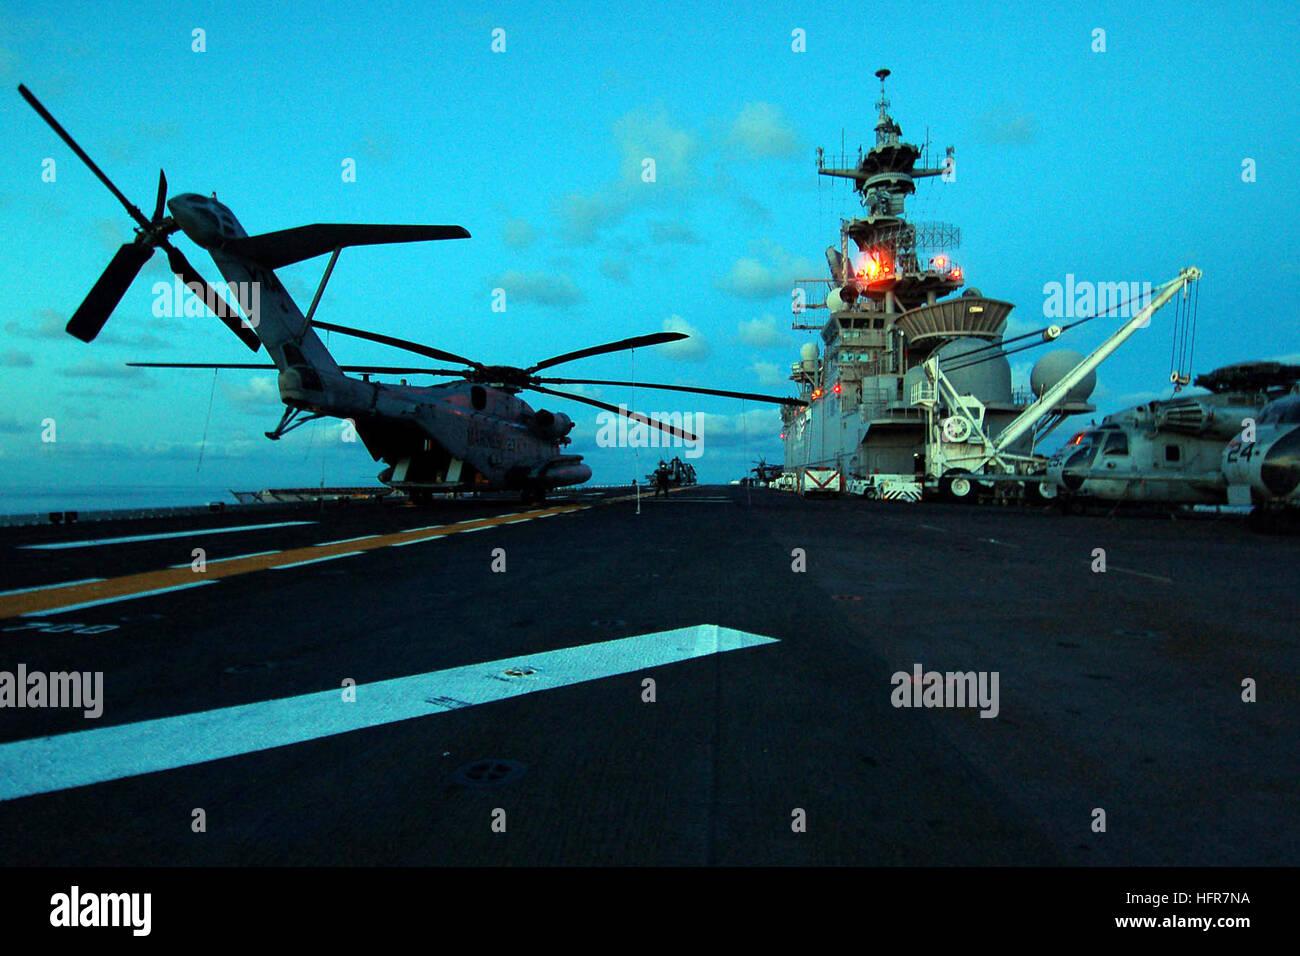 060613-N-6282K-001 Atlantic Ocean (June 13, 2006) - A CH-53E Sea Stallion sits on the flight deck of the multi-purpose - Stock Image